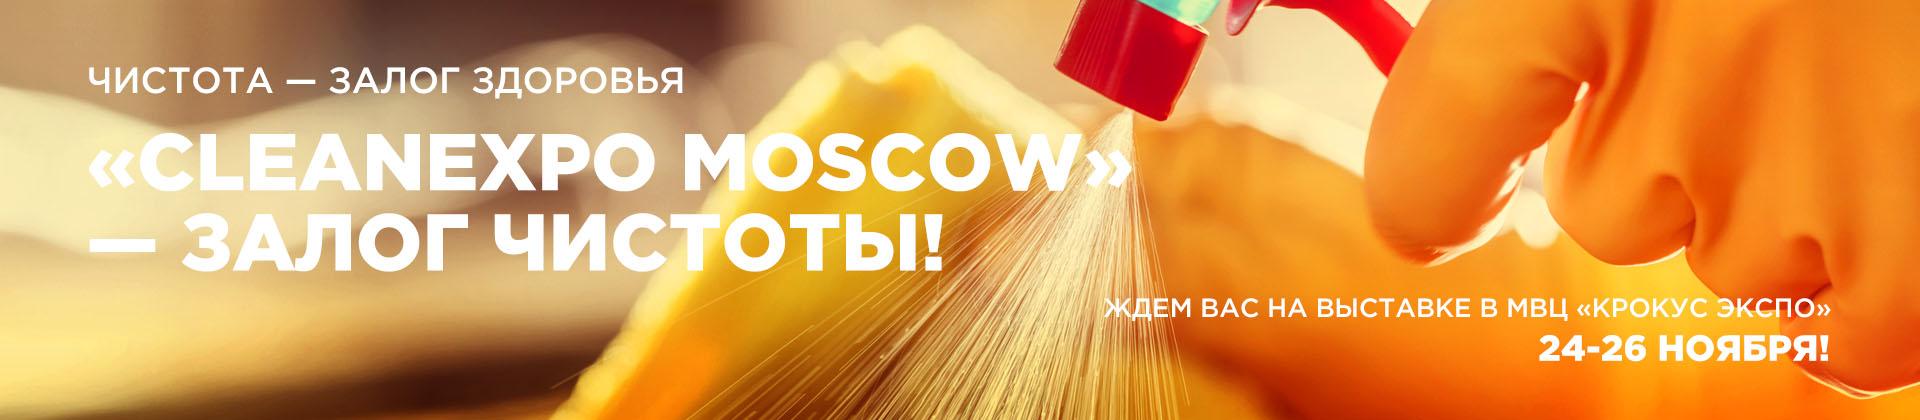 Чистота – залог здоровья. Выставка «CleanExpo Moscow» – залог чистоты!